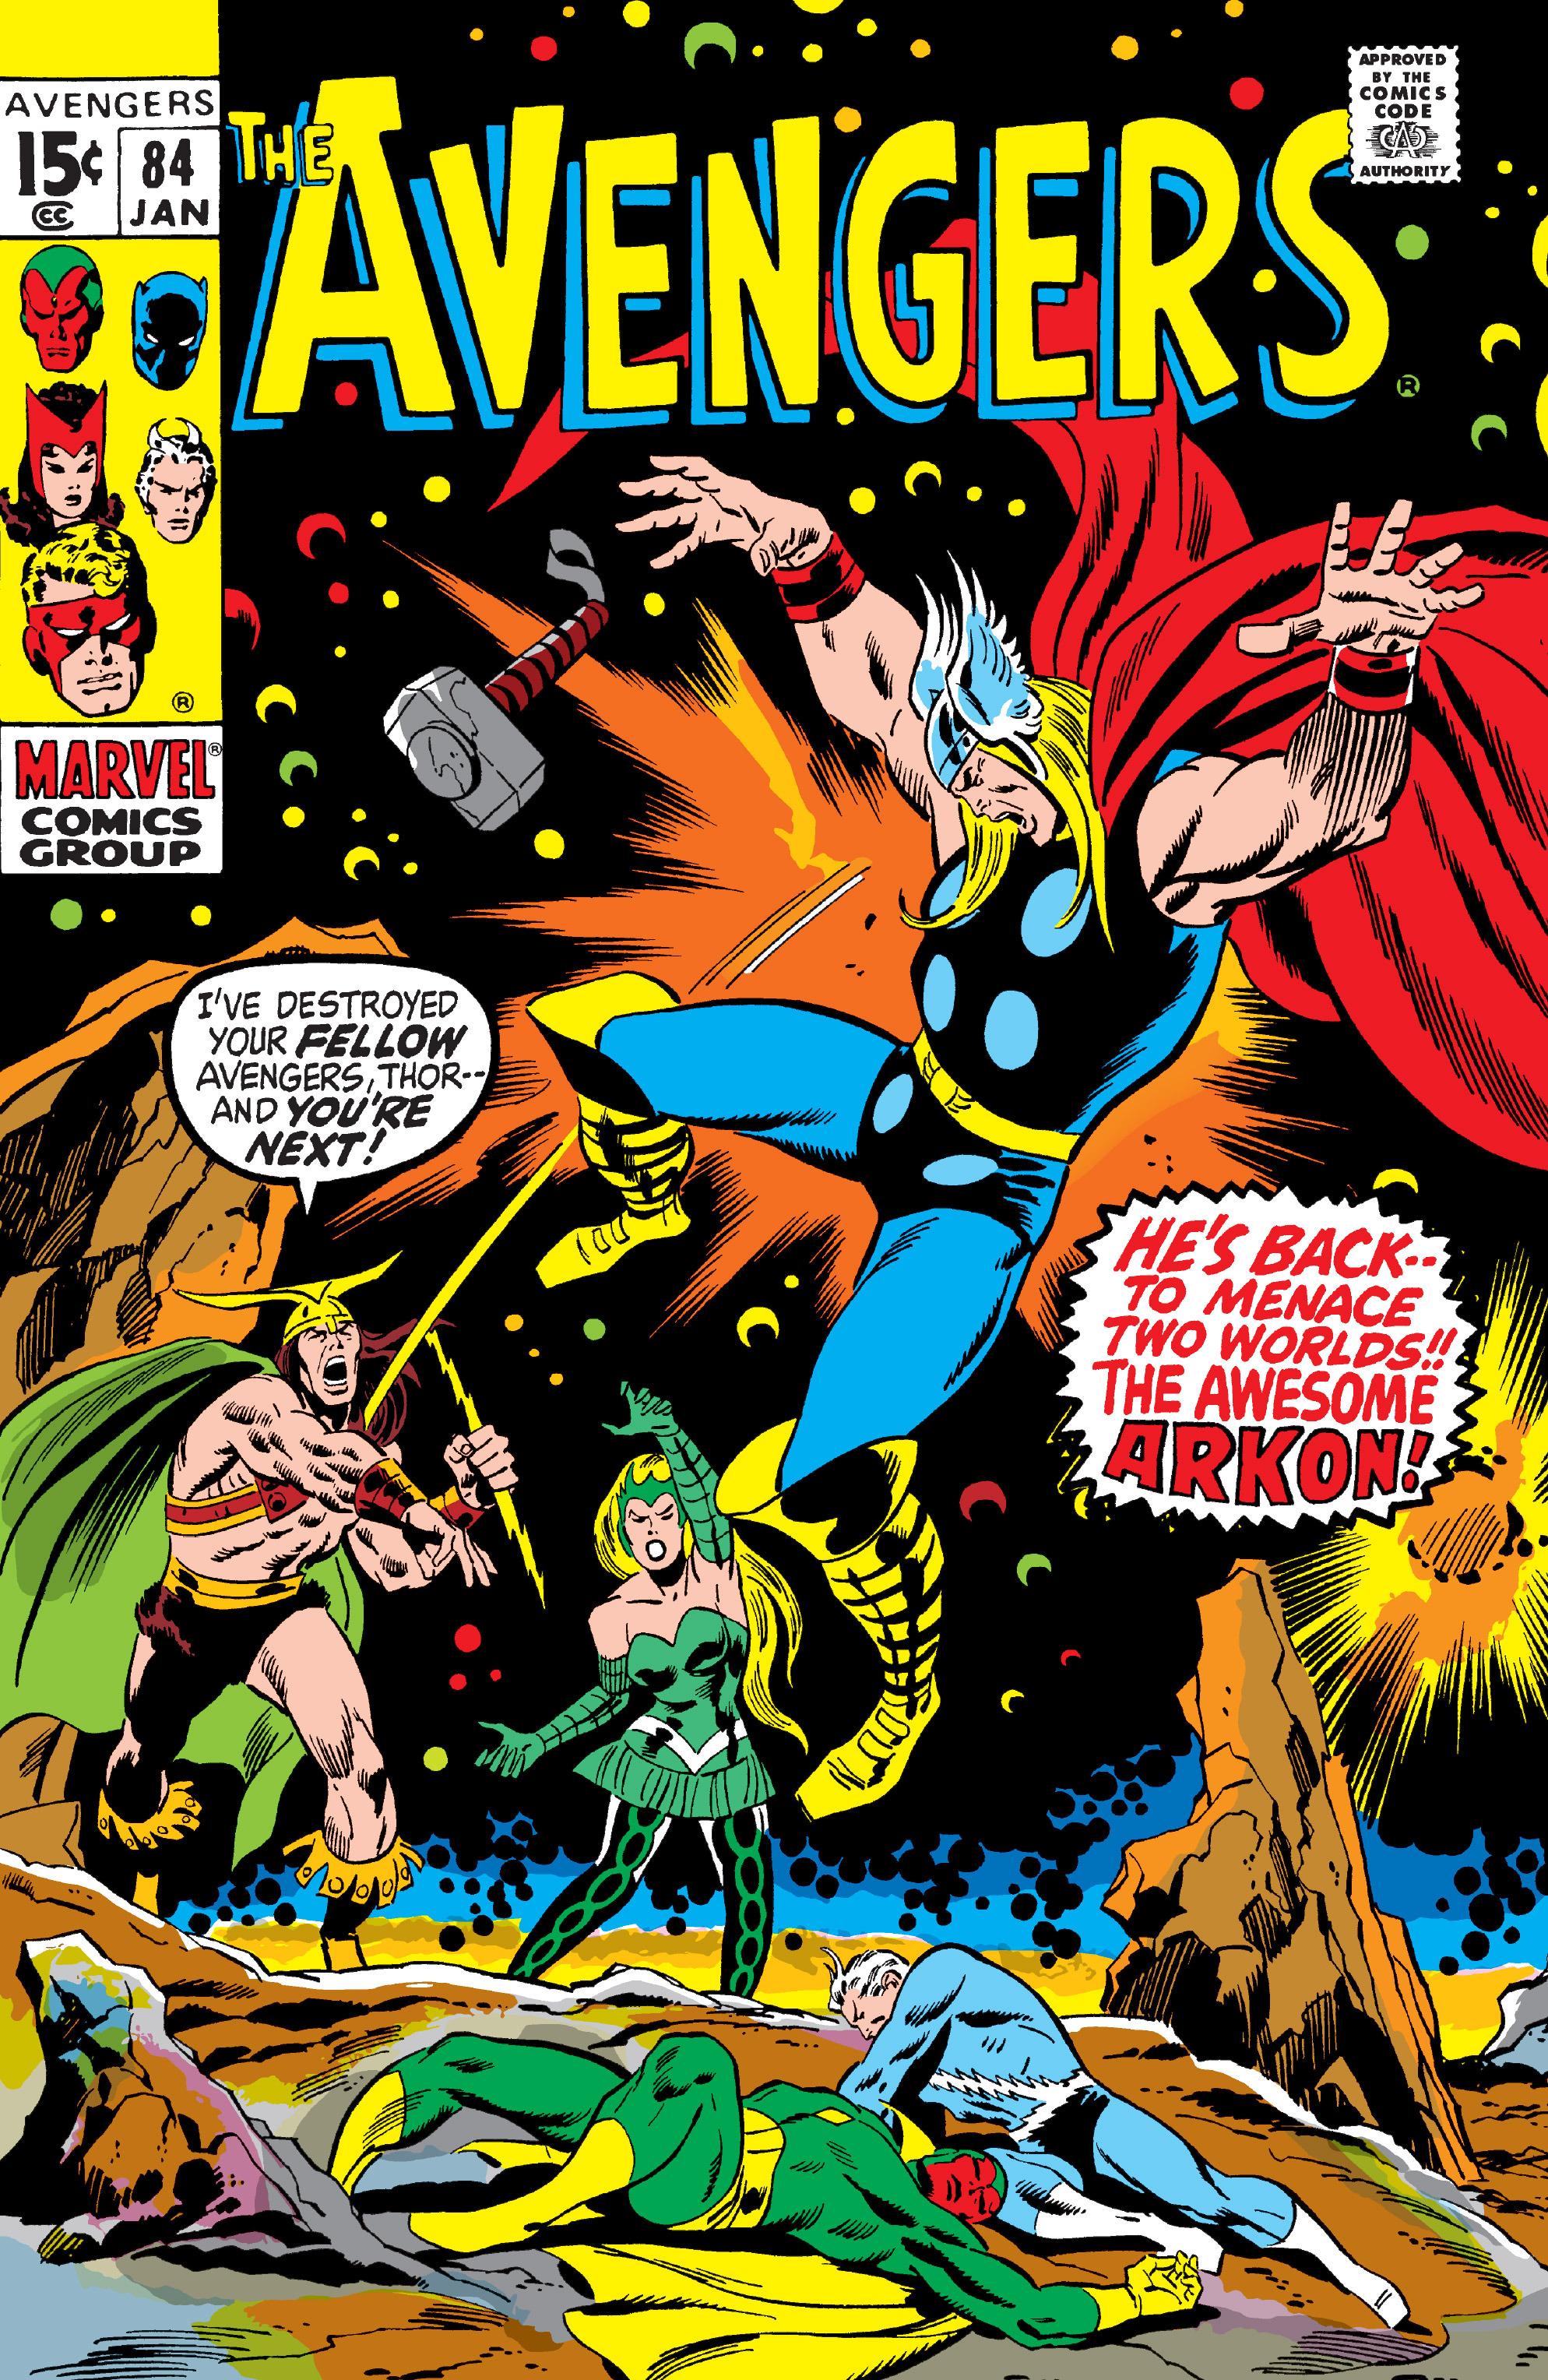 Avengers Vol 1 84